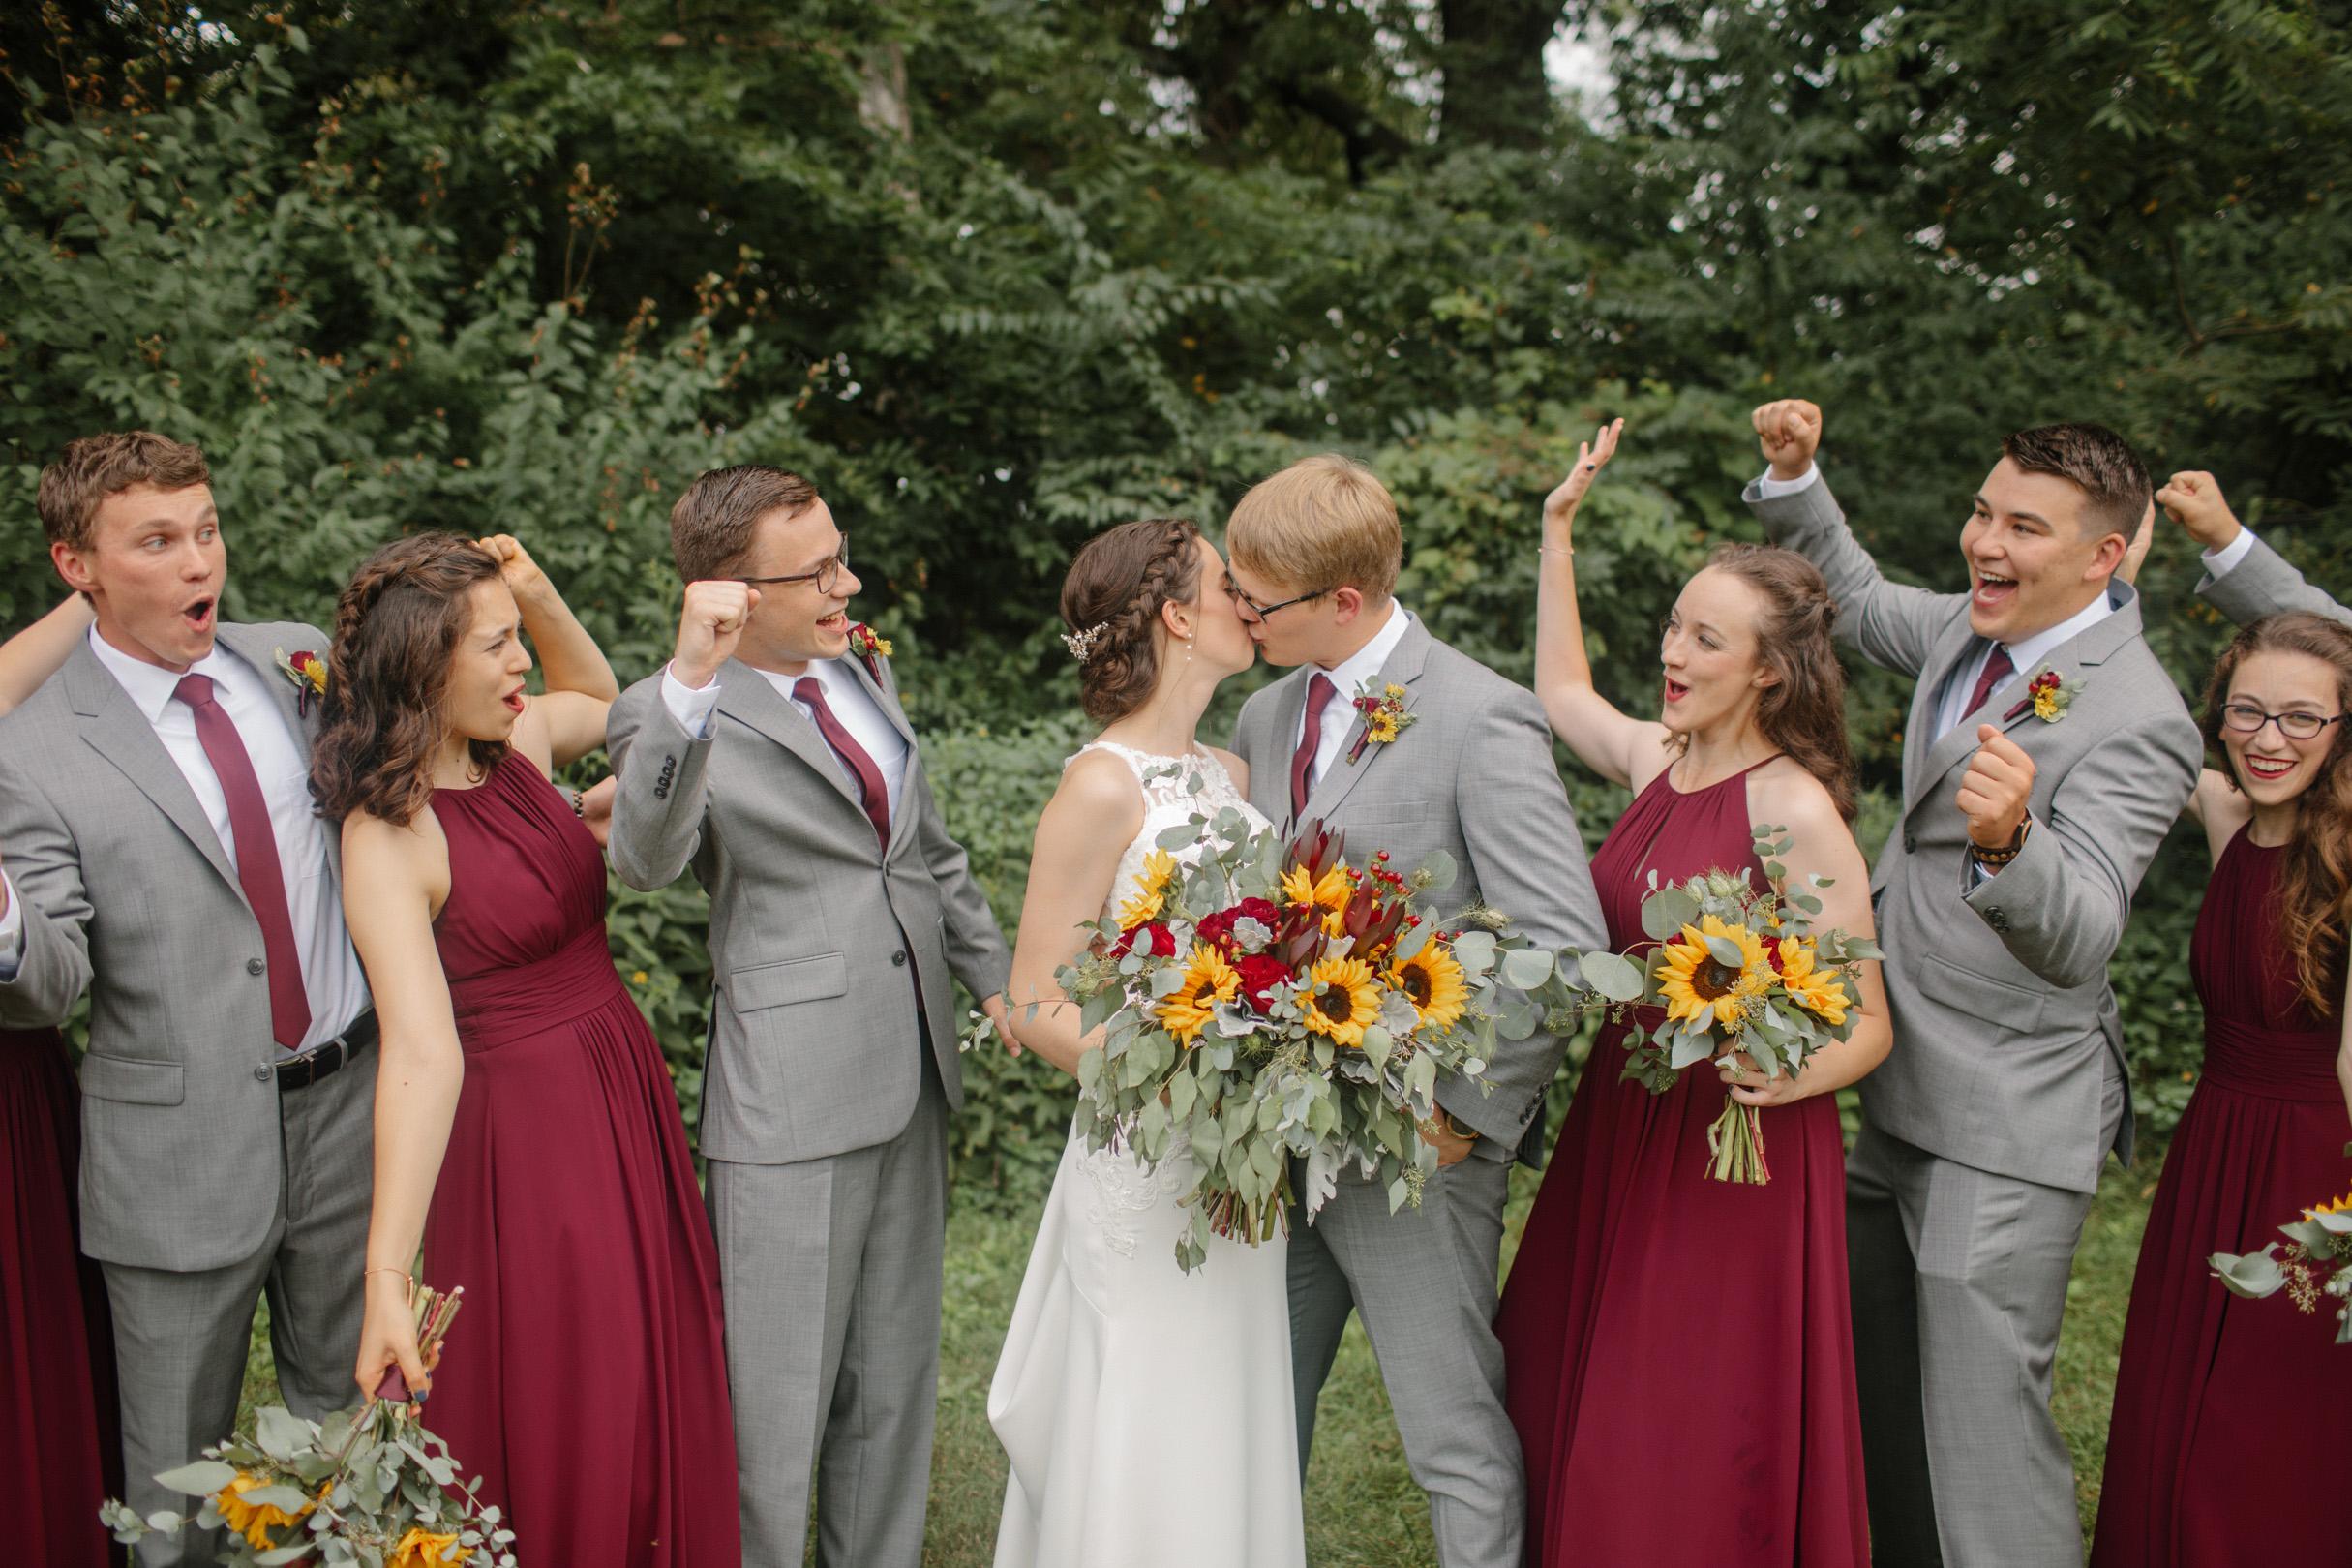 gabby_david_the_chateau_white_oak_wedding_48